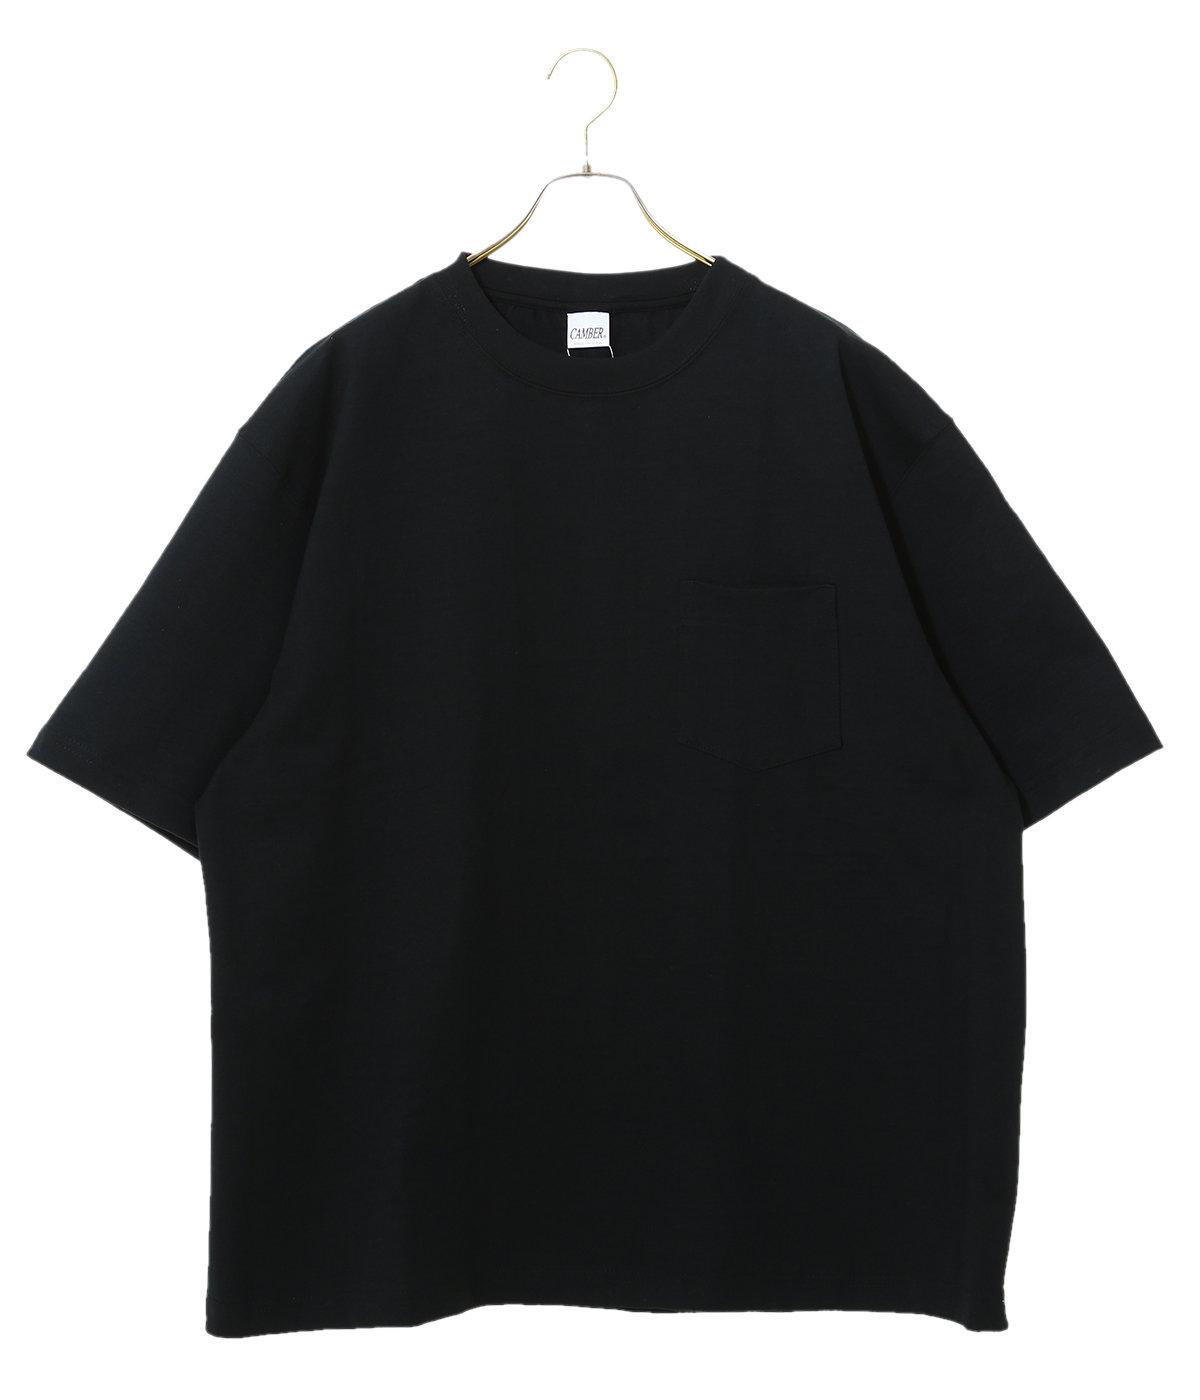 8oz POCKET T-SHIRT (XXLサイズ)